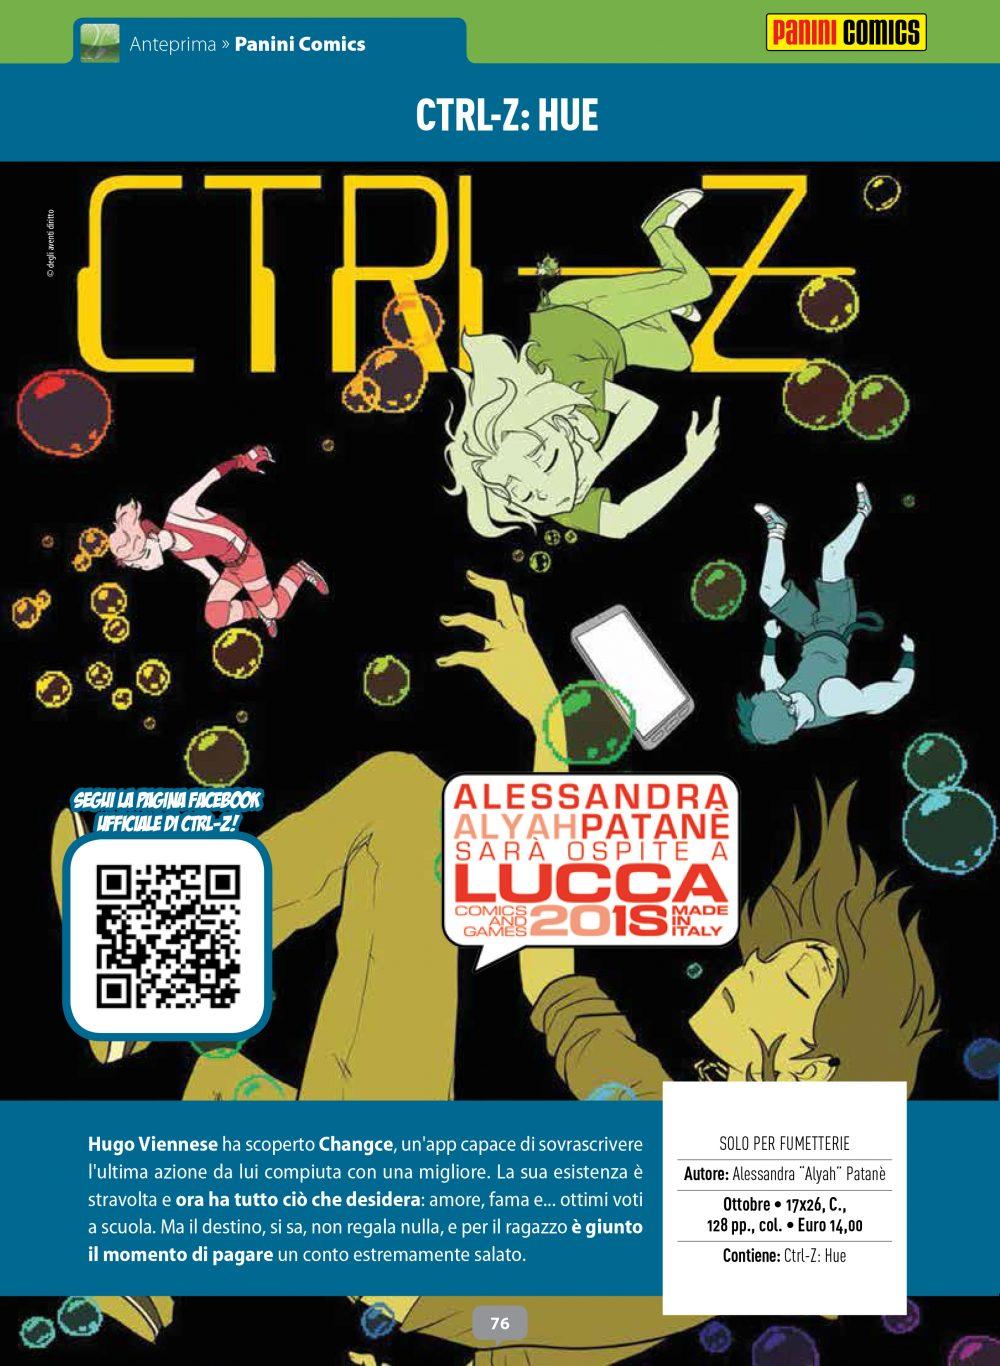 CTRL-Z: Hue su Anteprima